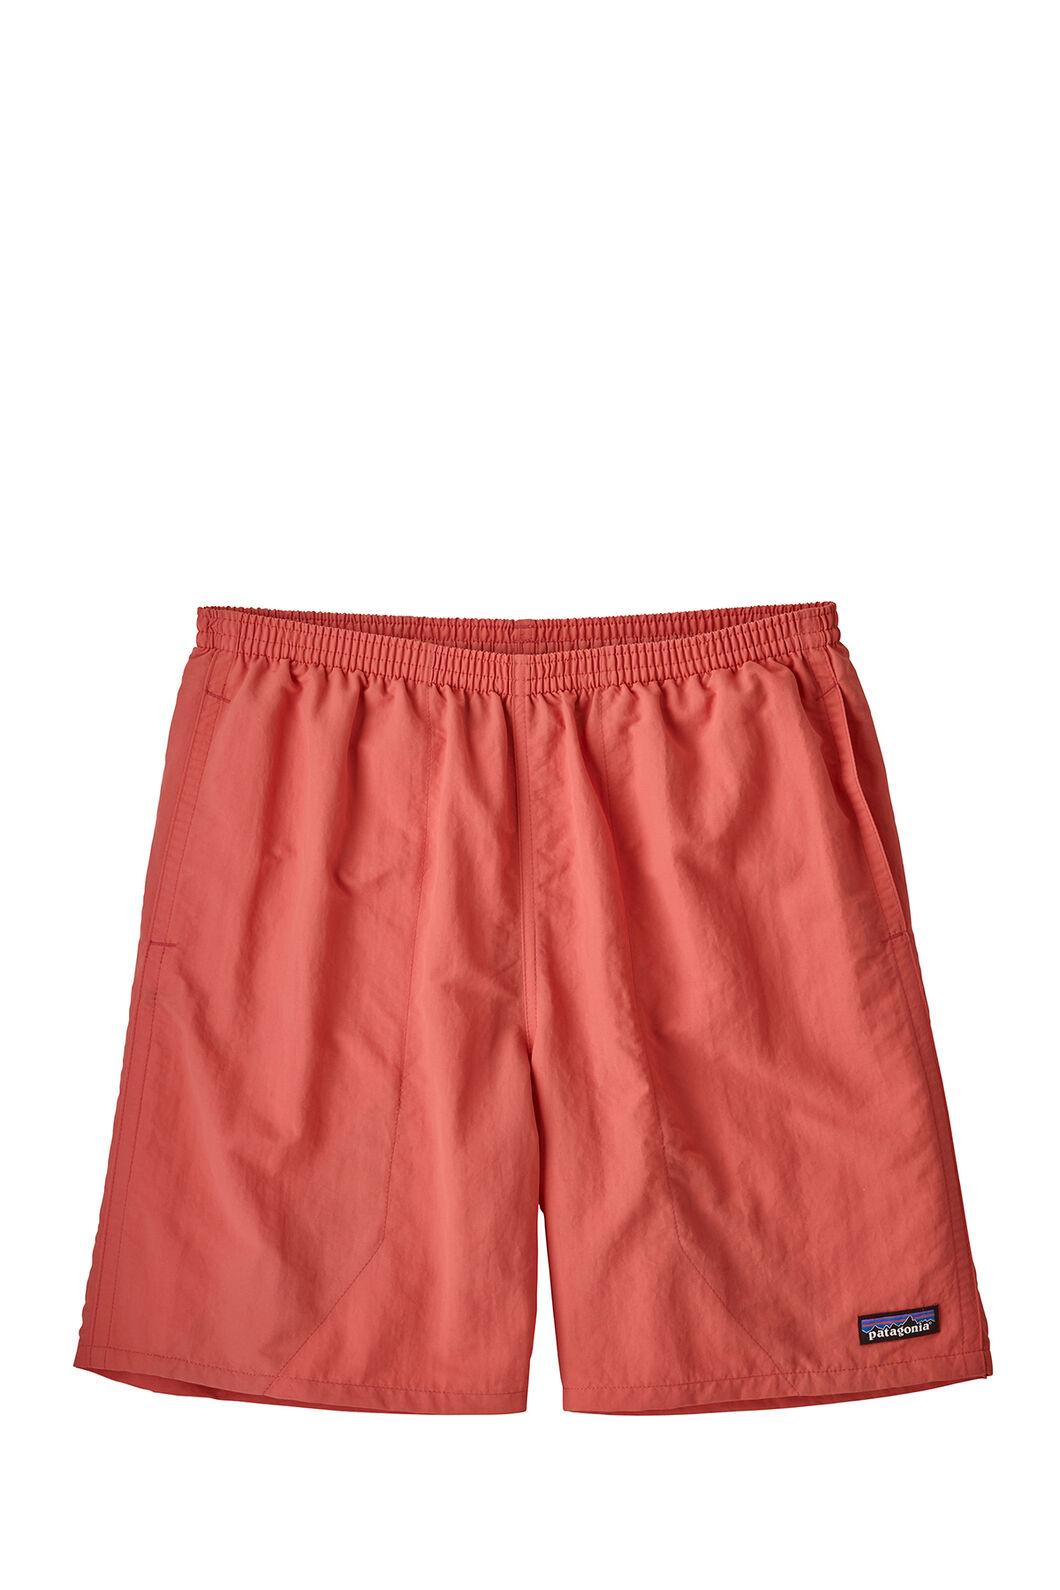 "Patagonia Baggies Longs Shorts 7"" — Men's, Spiced Coral, hi-res"